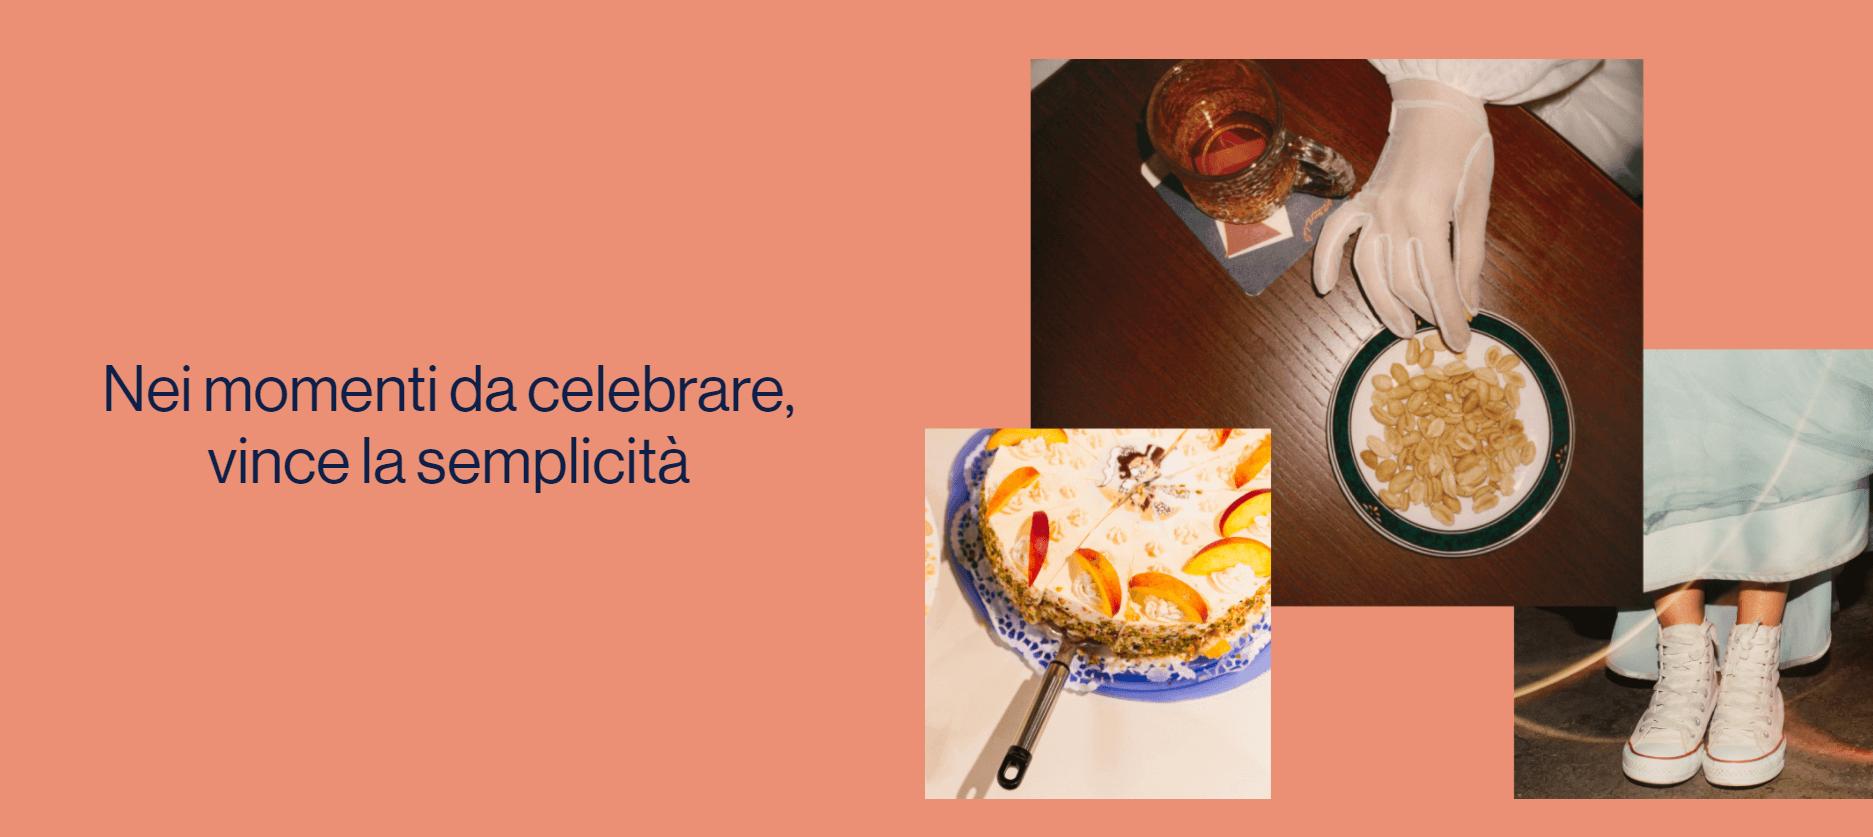 Pinterest 2021 Celebrazioni